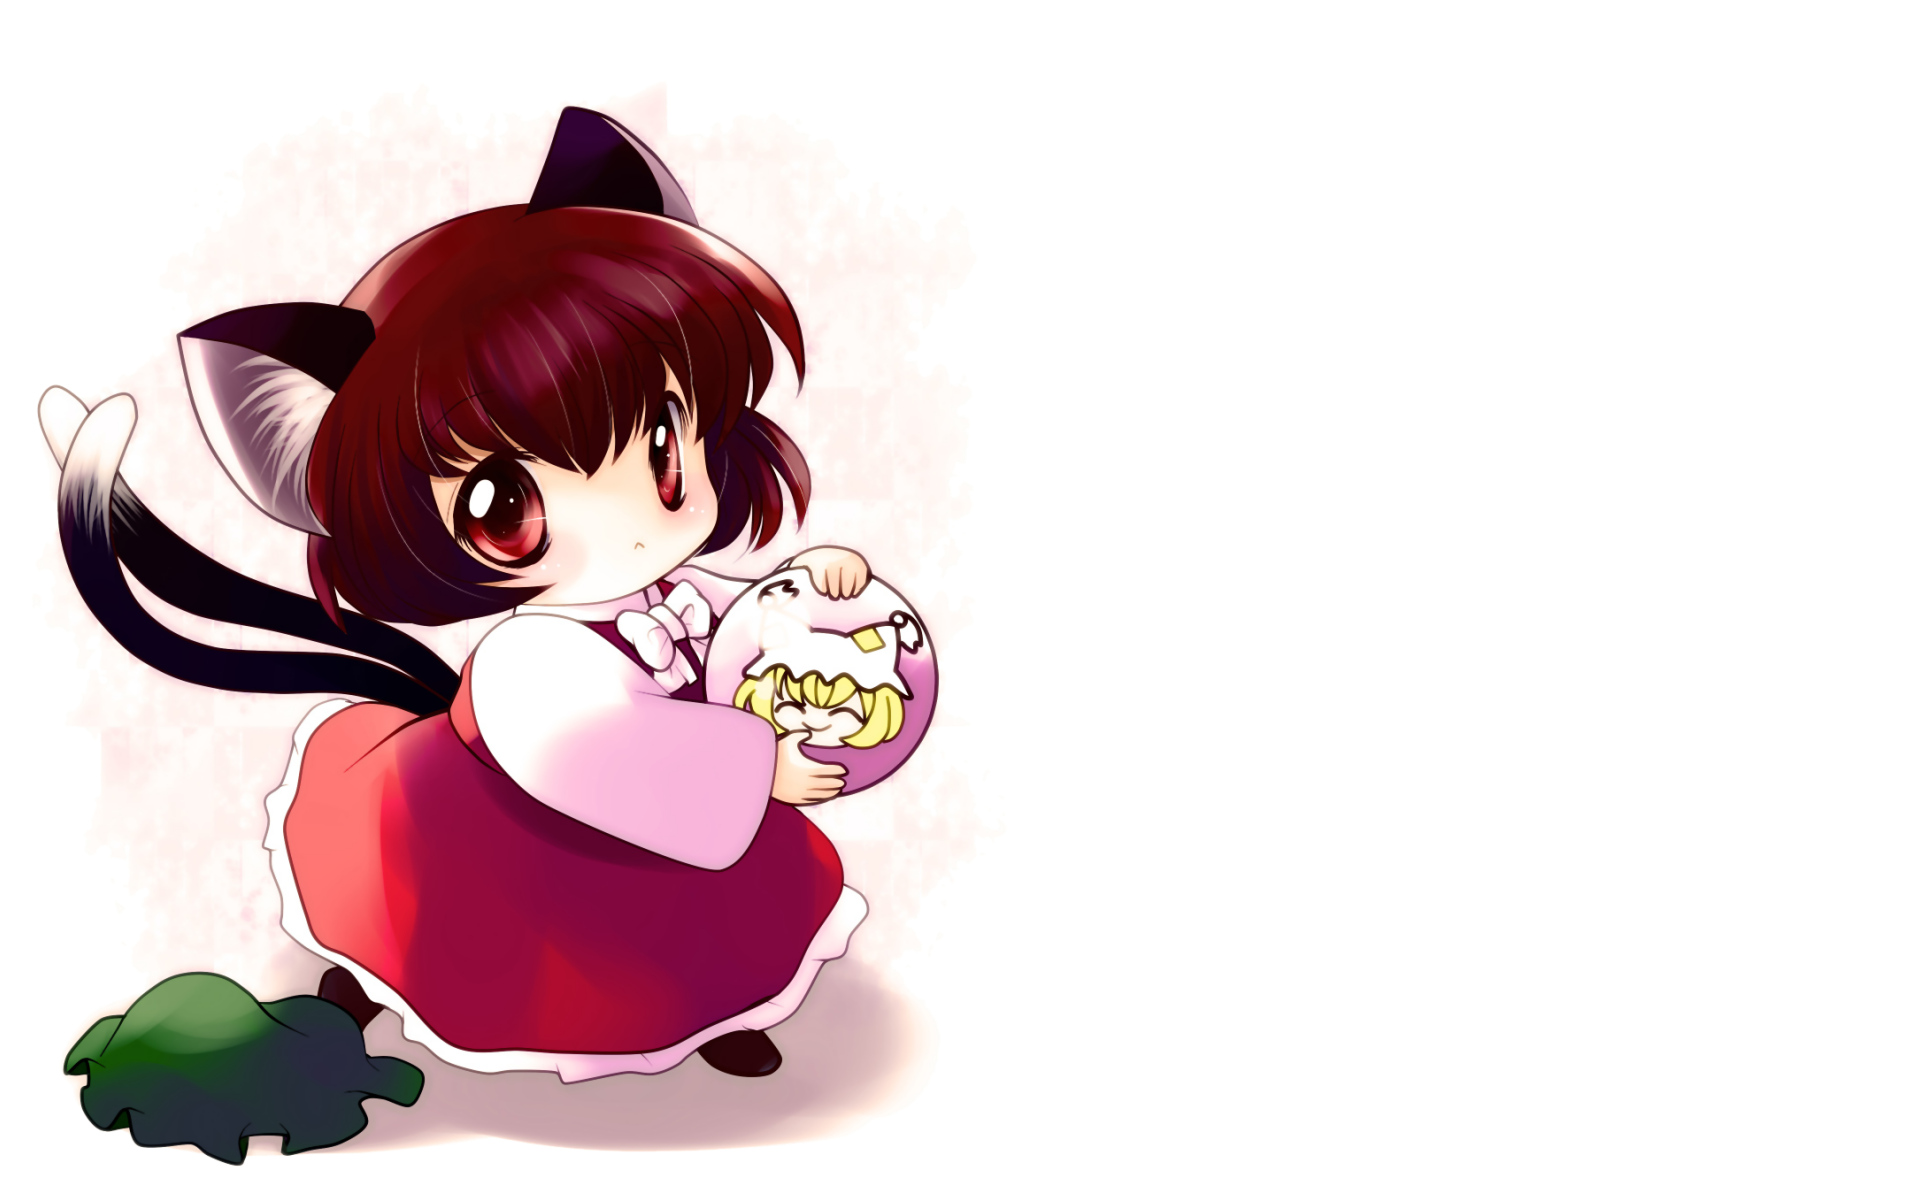 animal_ears catgirl chen chibi hat multiple_tails tail touhou white yakumo_ran yume_shokunin